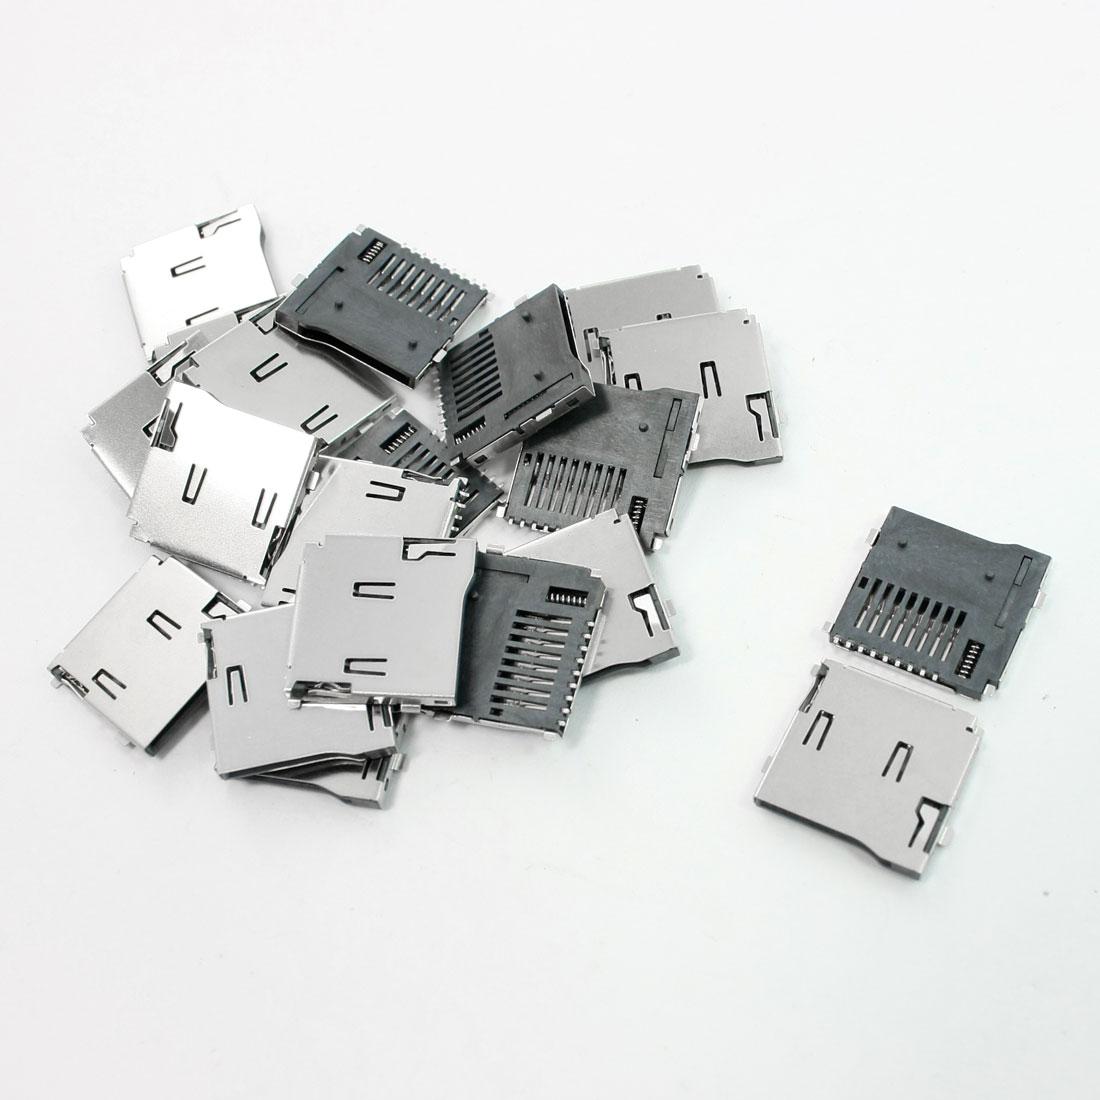 20 Pcs TF Transflash Micro SD Memory Card Quick Flip Sockets